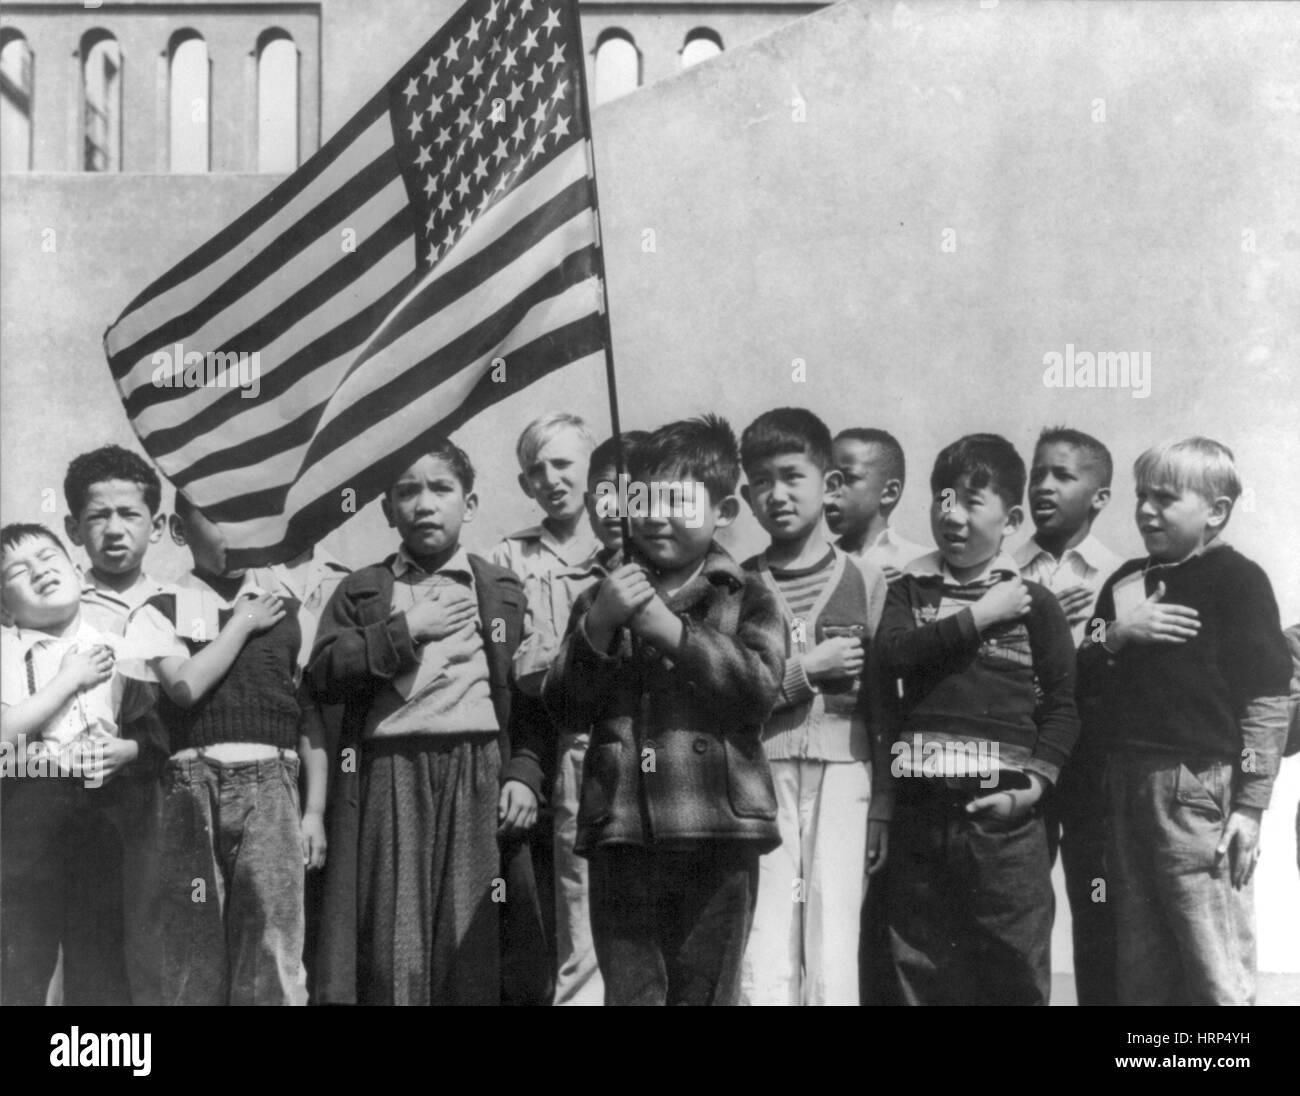 Pledge of Allegiance, 1942 - Stock Image